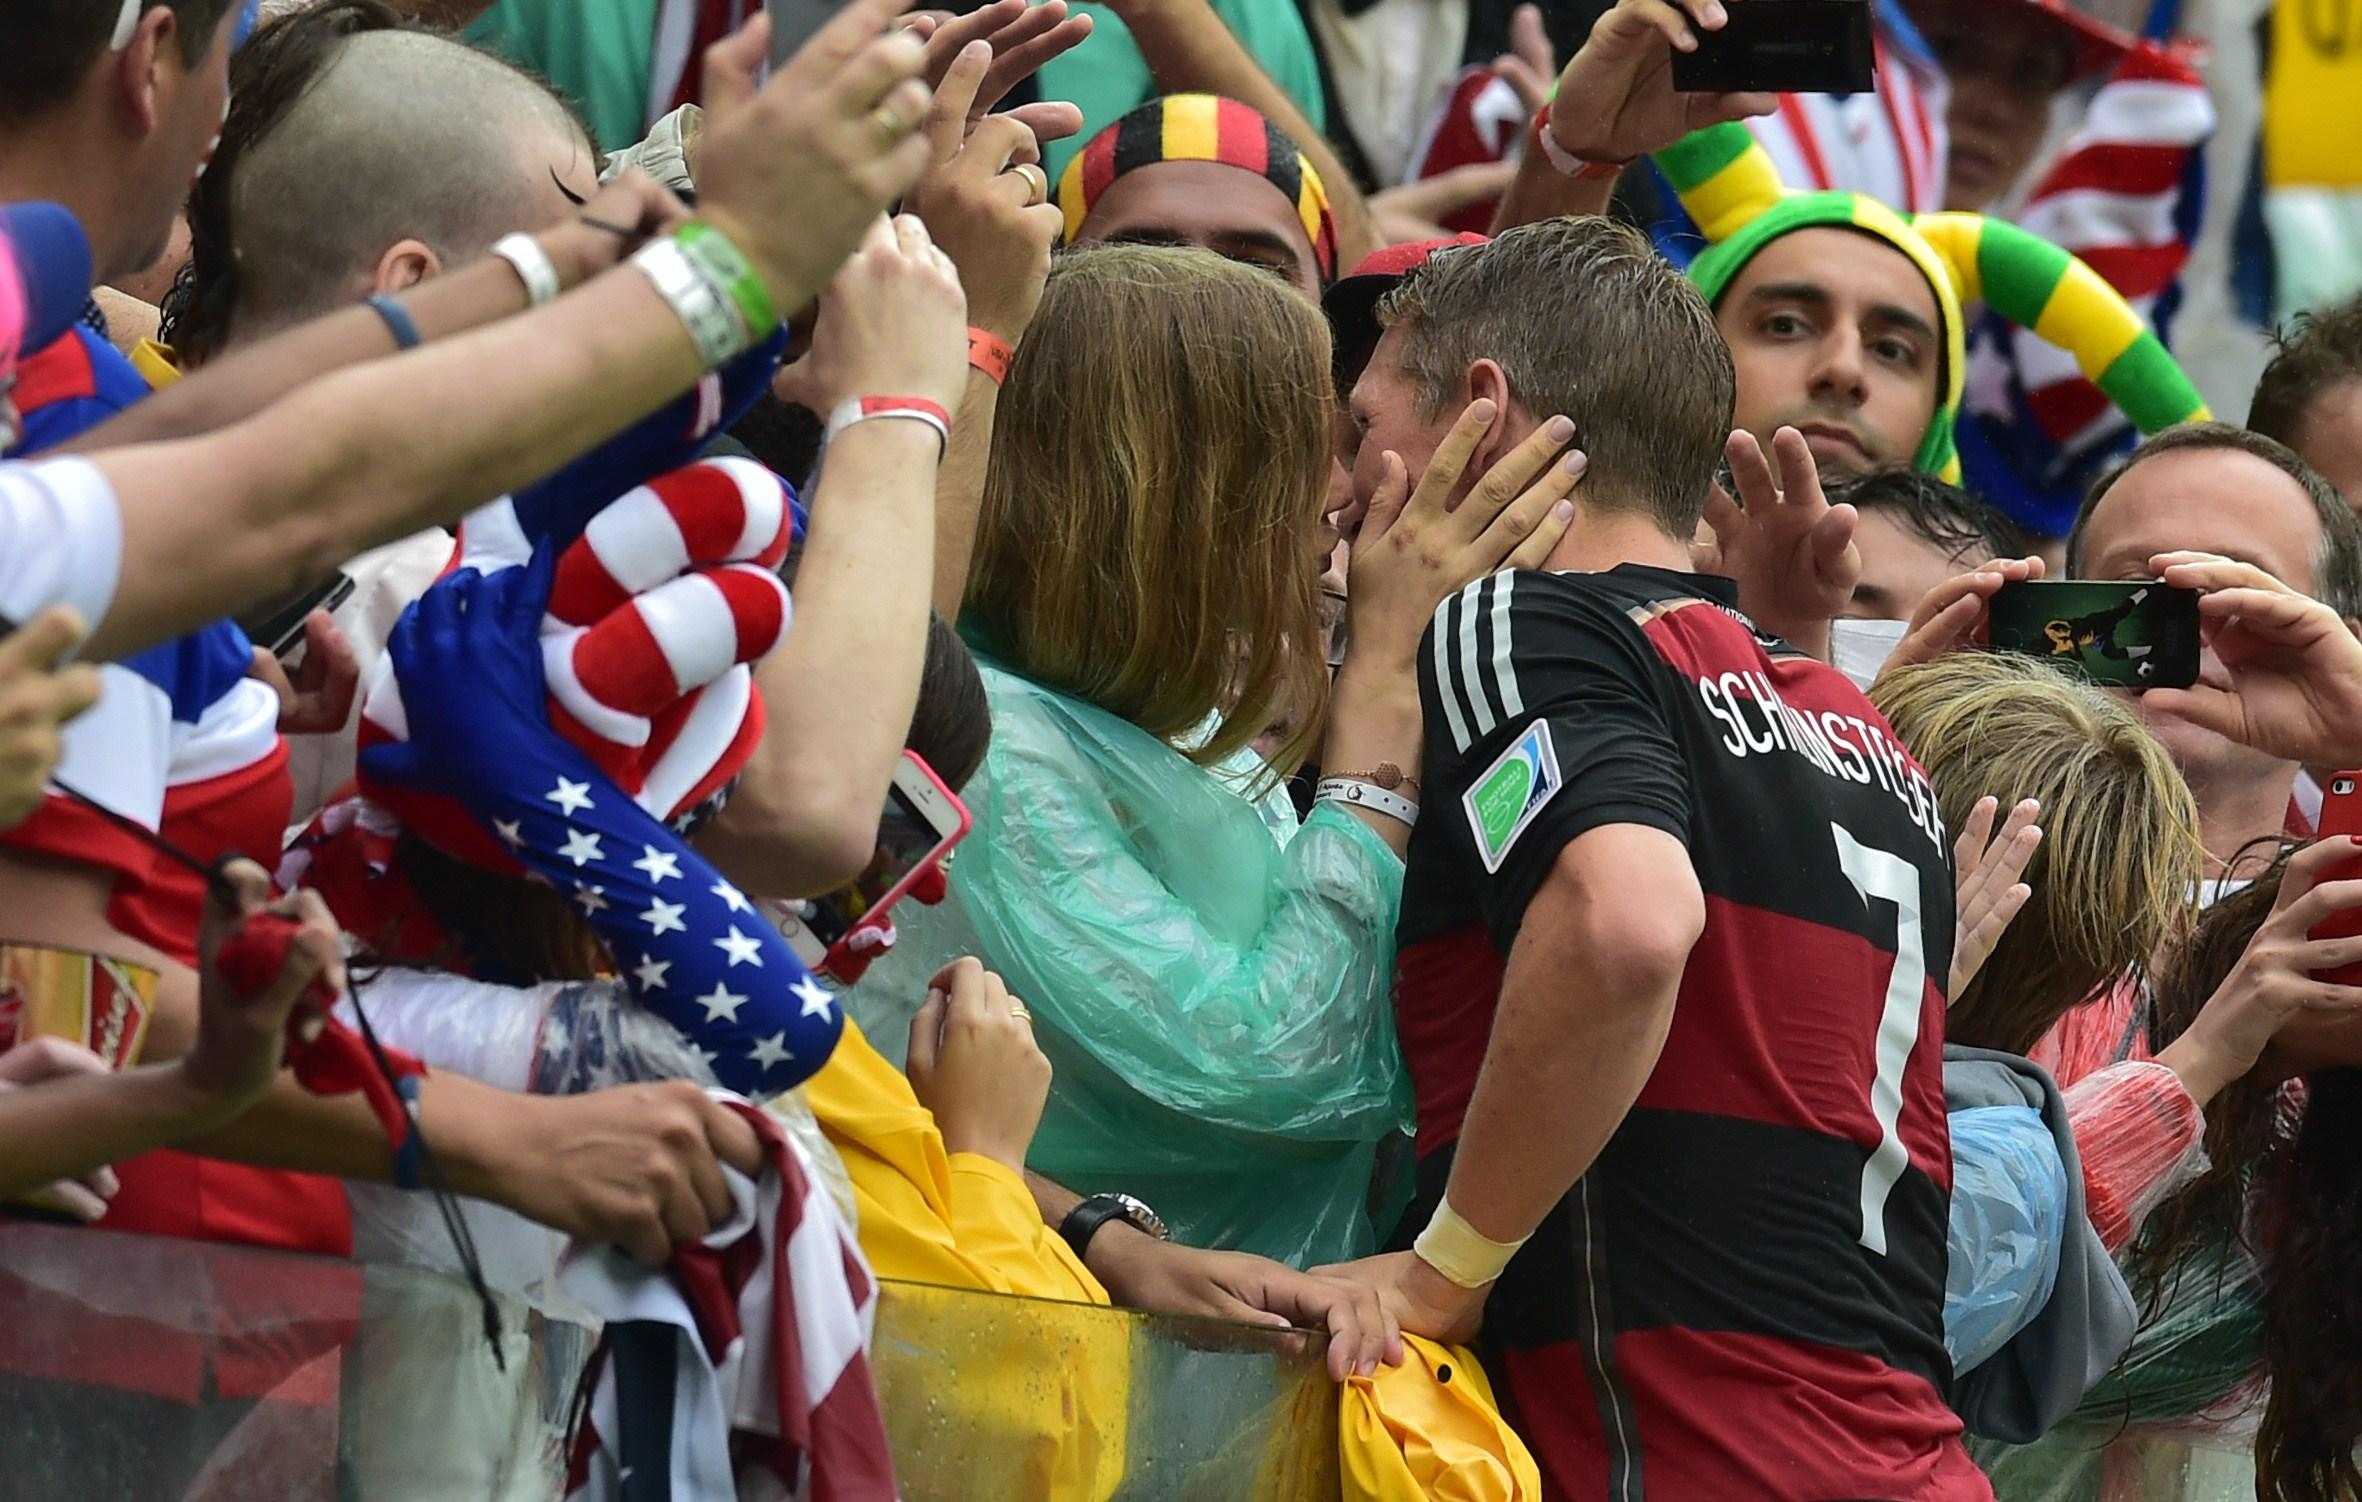 Sarah Brandner kisses boyfriend Bastian Schweinsteiger after Germany's World Cup Group Stage win over USA, 6/26/2014